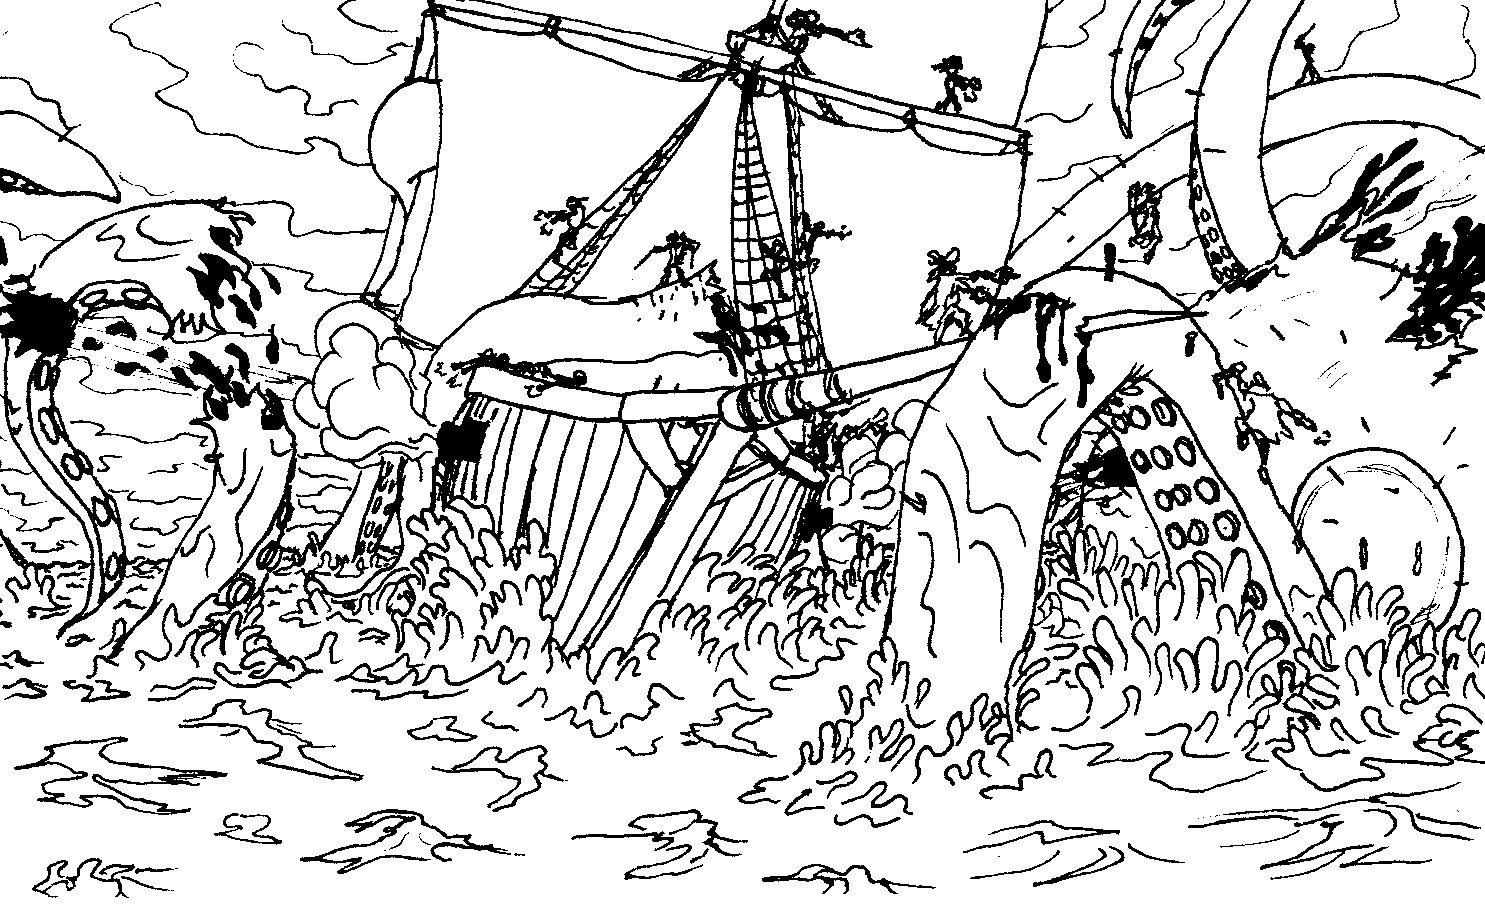 Kraken Battle By Iclhstudios Jpg 1485 906 Kraken Kids Playing Coloring Pages